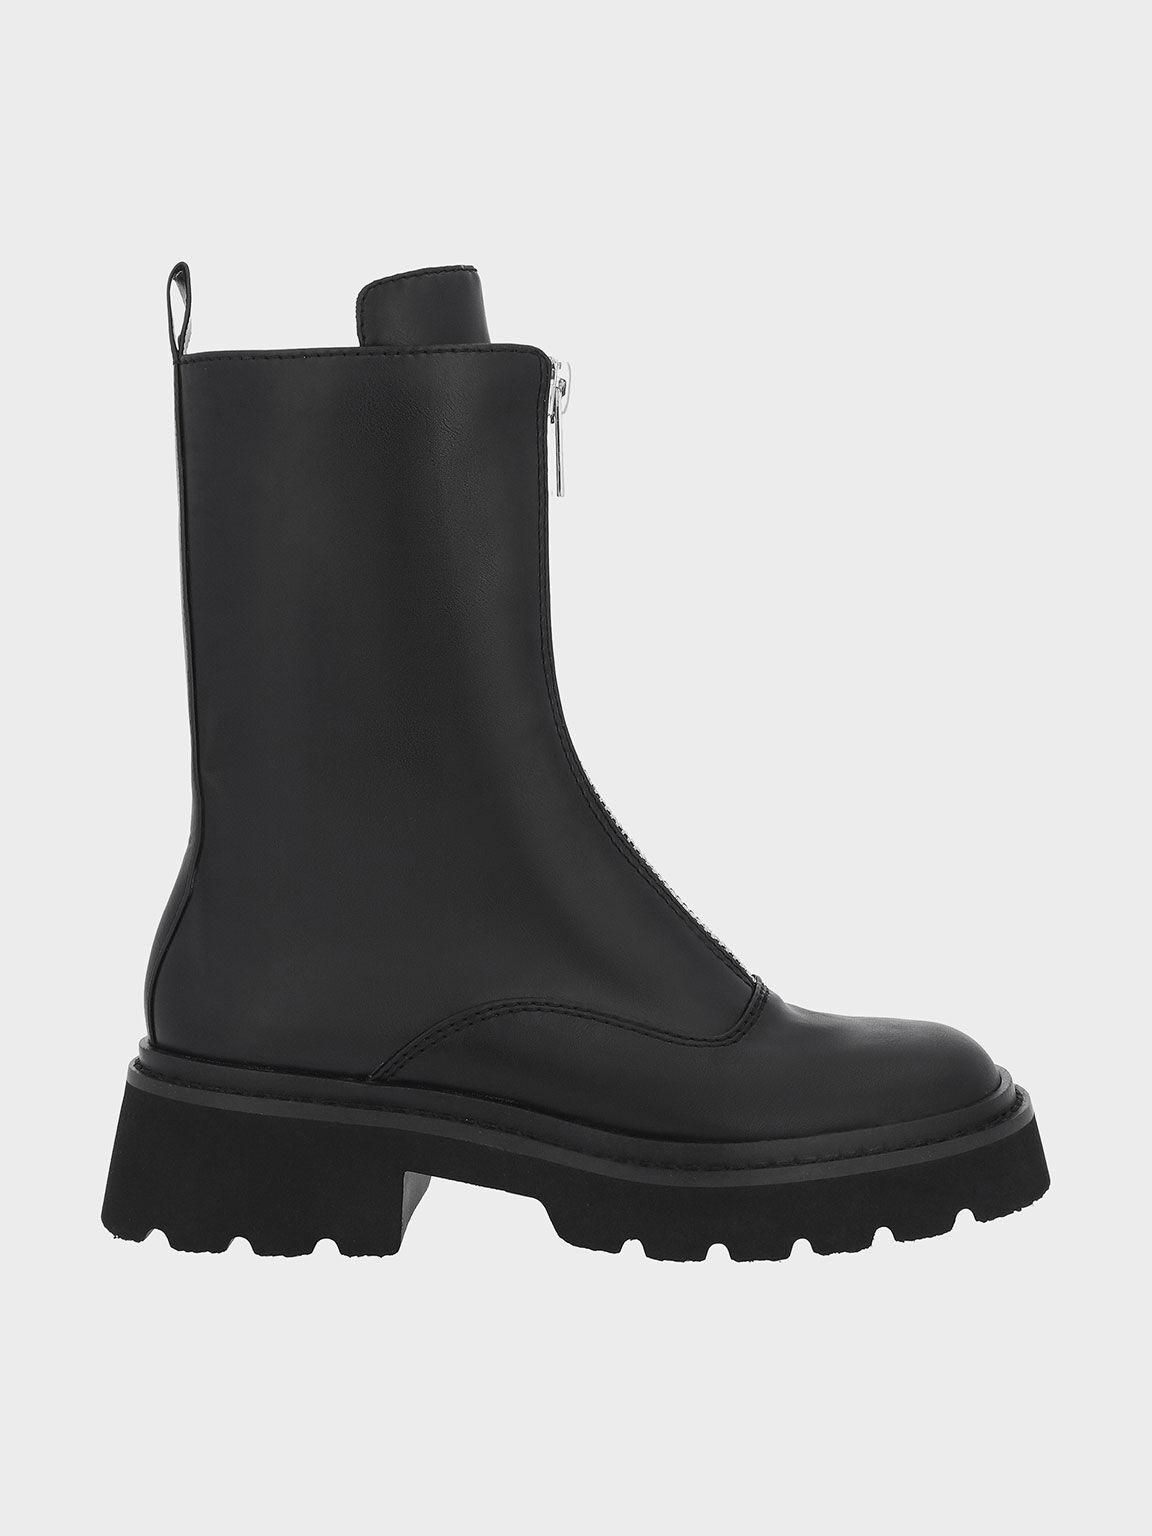 Billie Front-Zip Ankle Boots, Black, hi-res